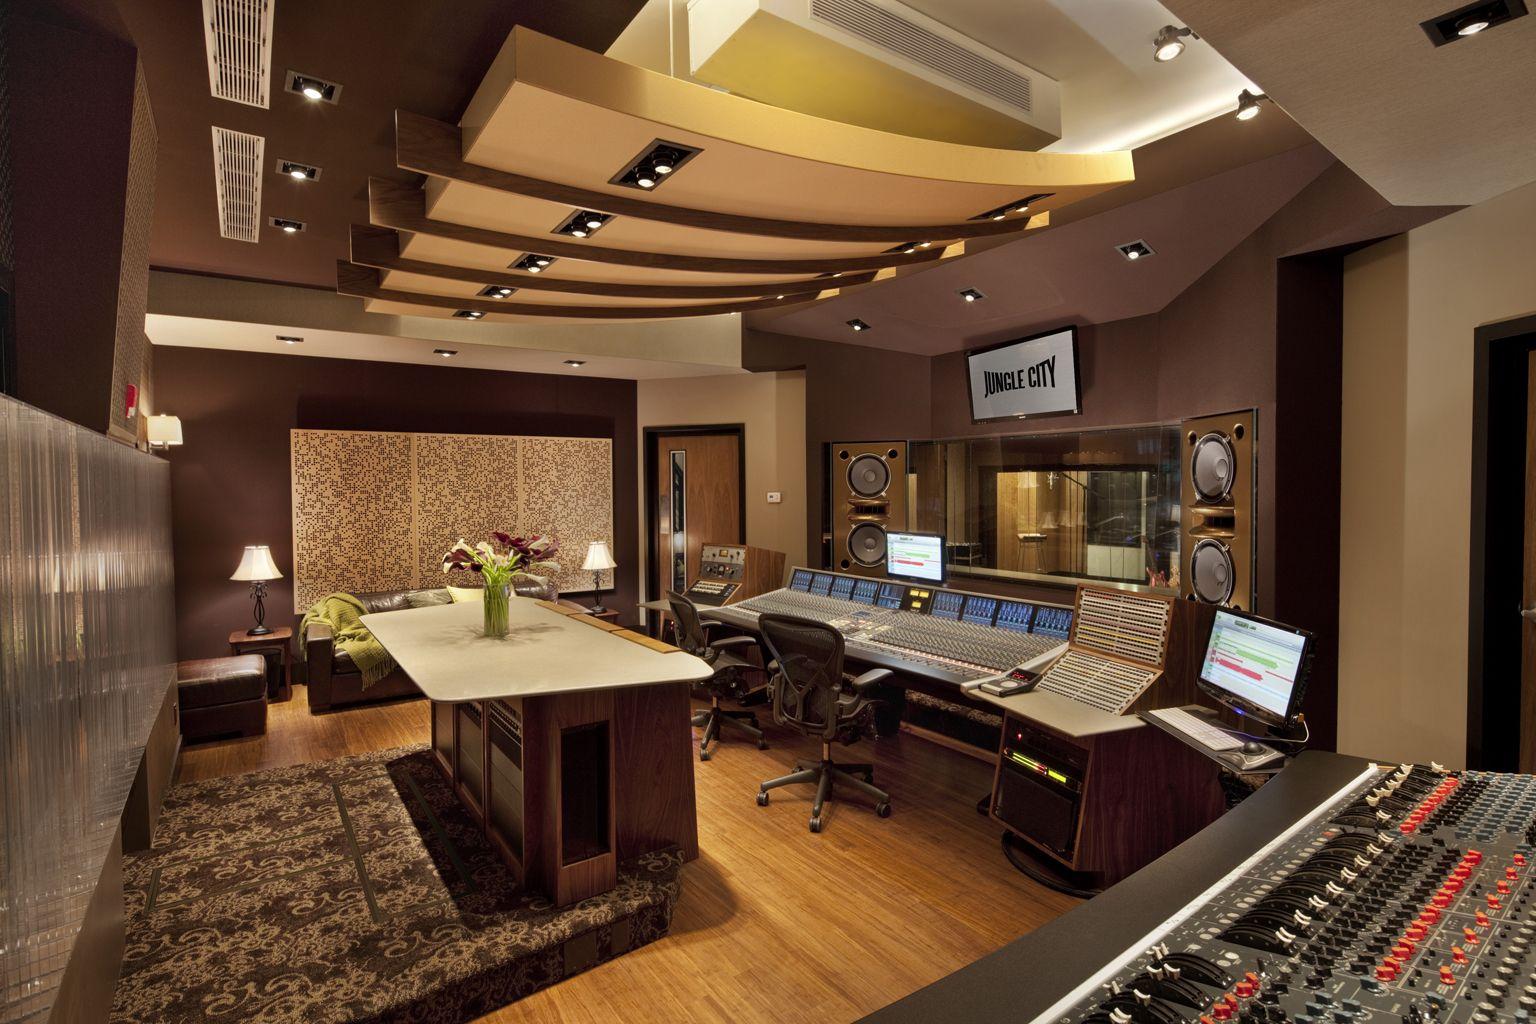 Best Kitchen Gallery: Home Recording Studio … Pinteres… of Home Recording Studio Design  on rachelxblog.com